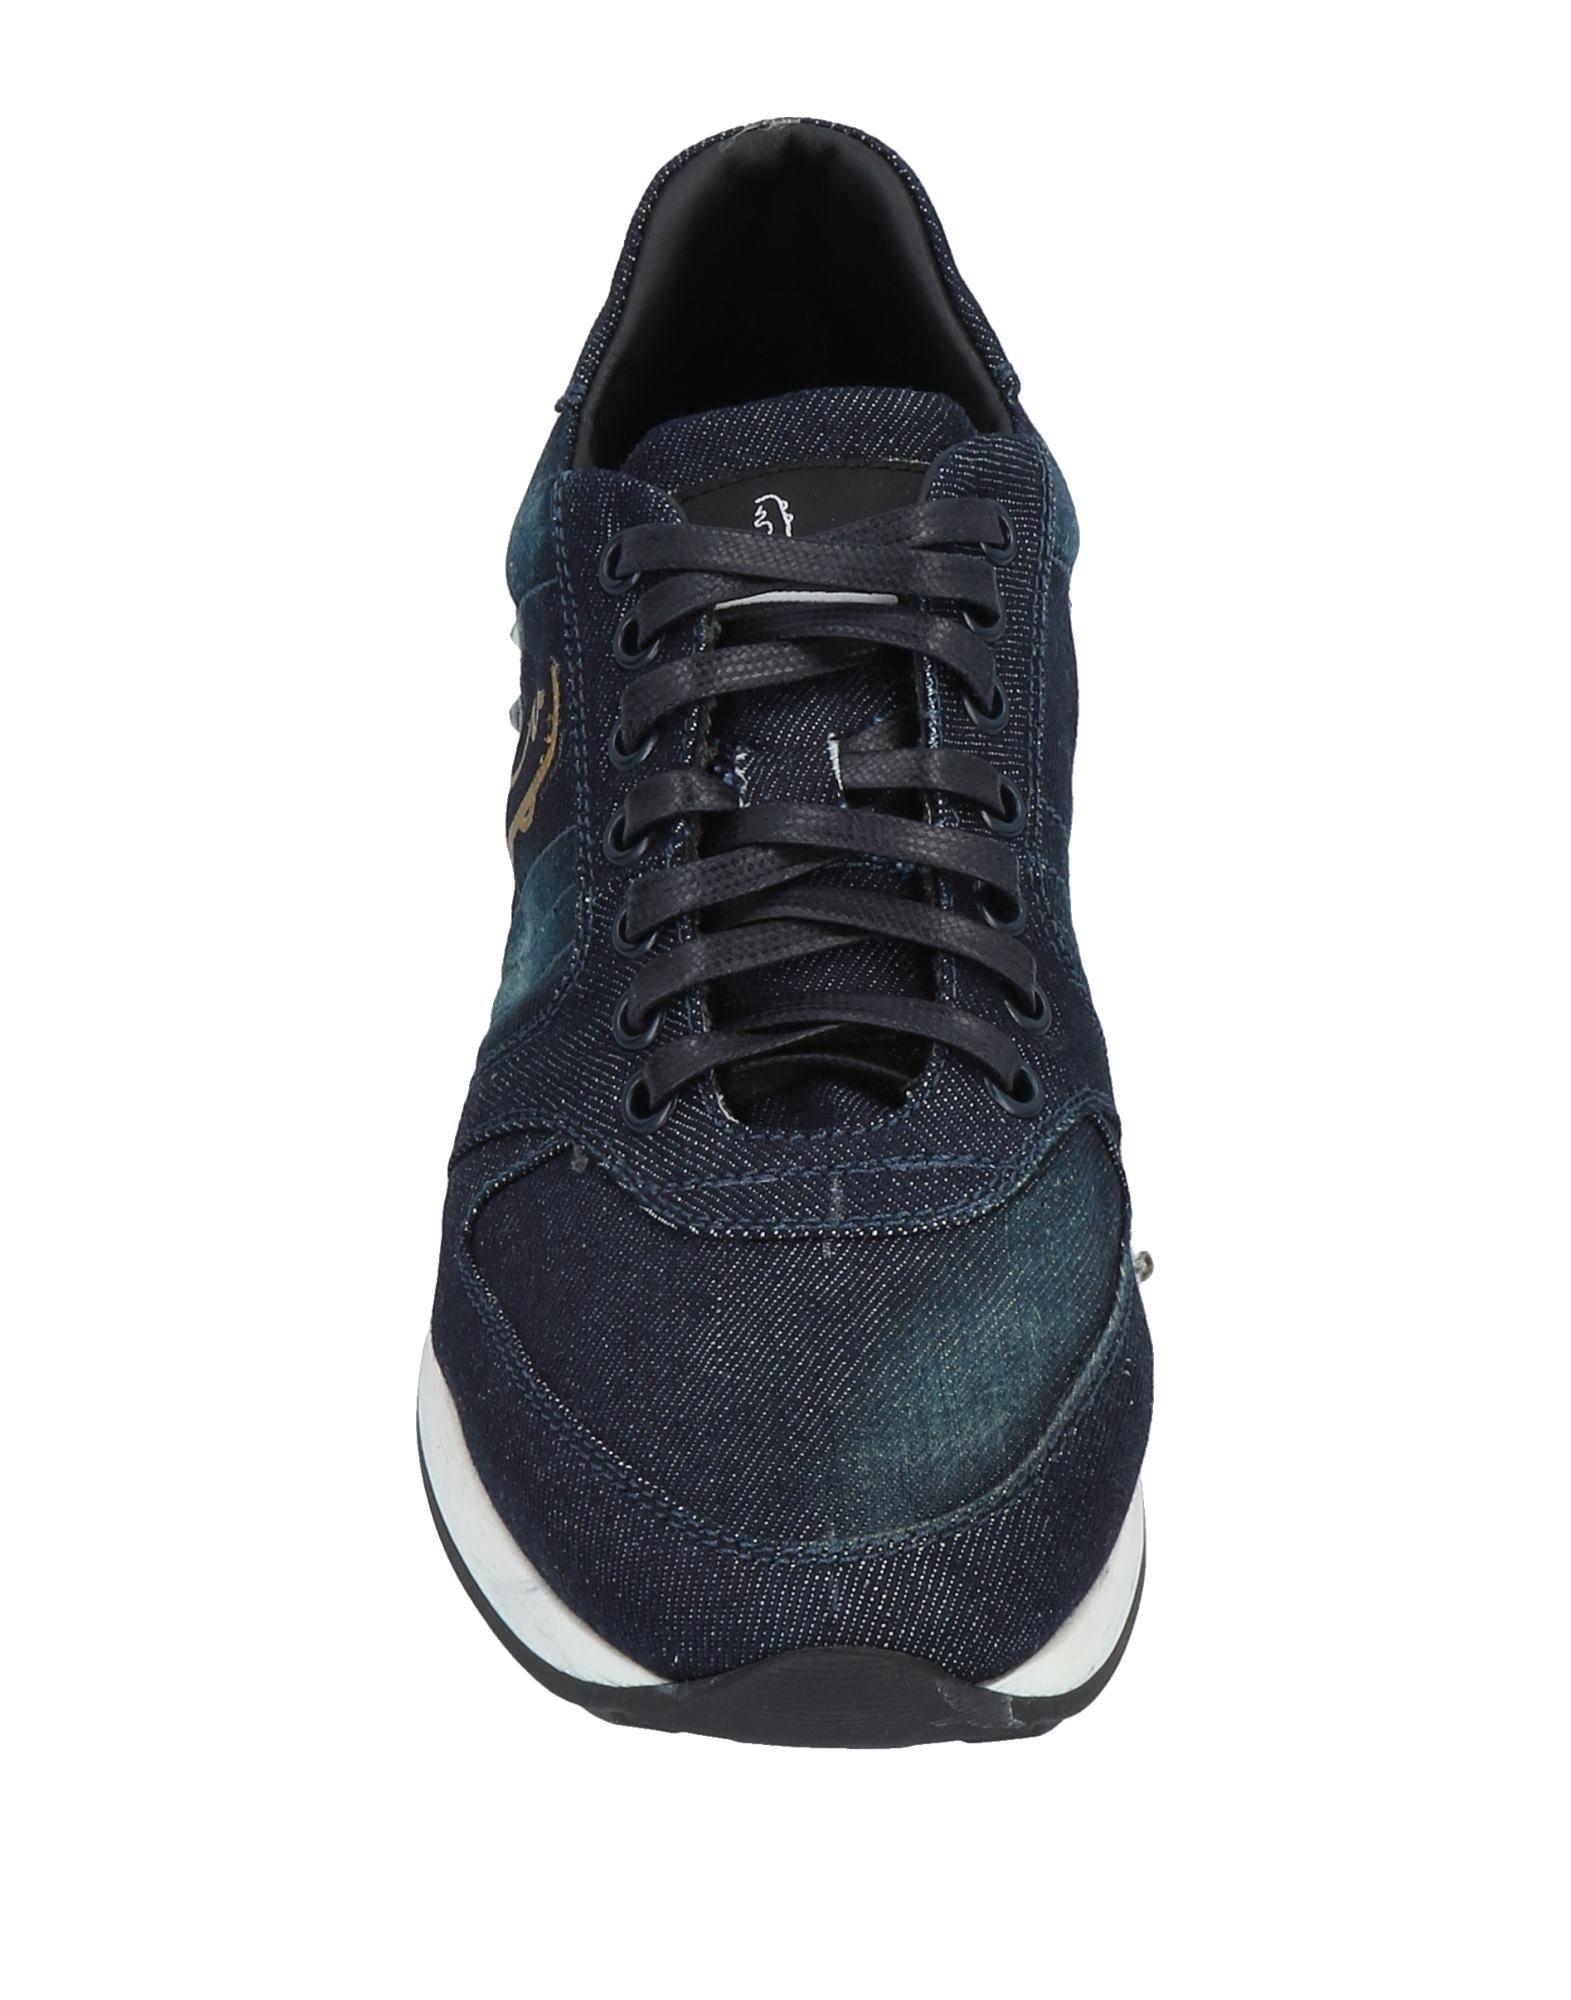 Stilvolle billige  Schuhe Primabase Sneakers Damen  billige 11486409DC 6a4090